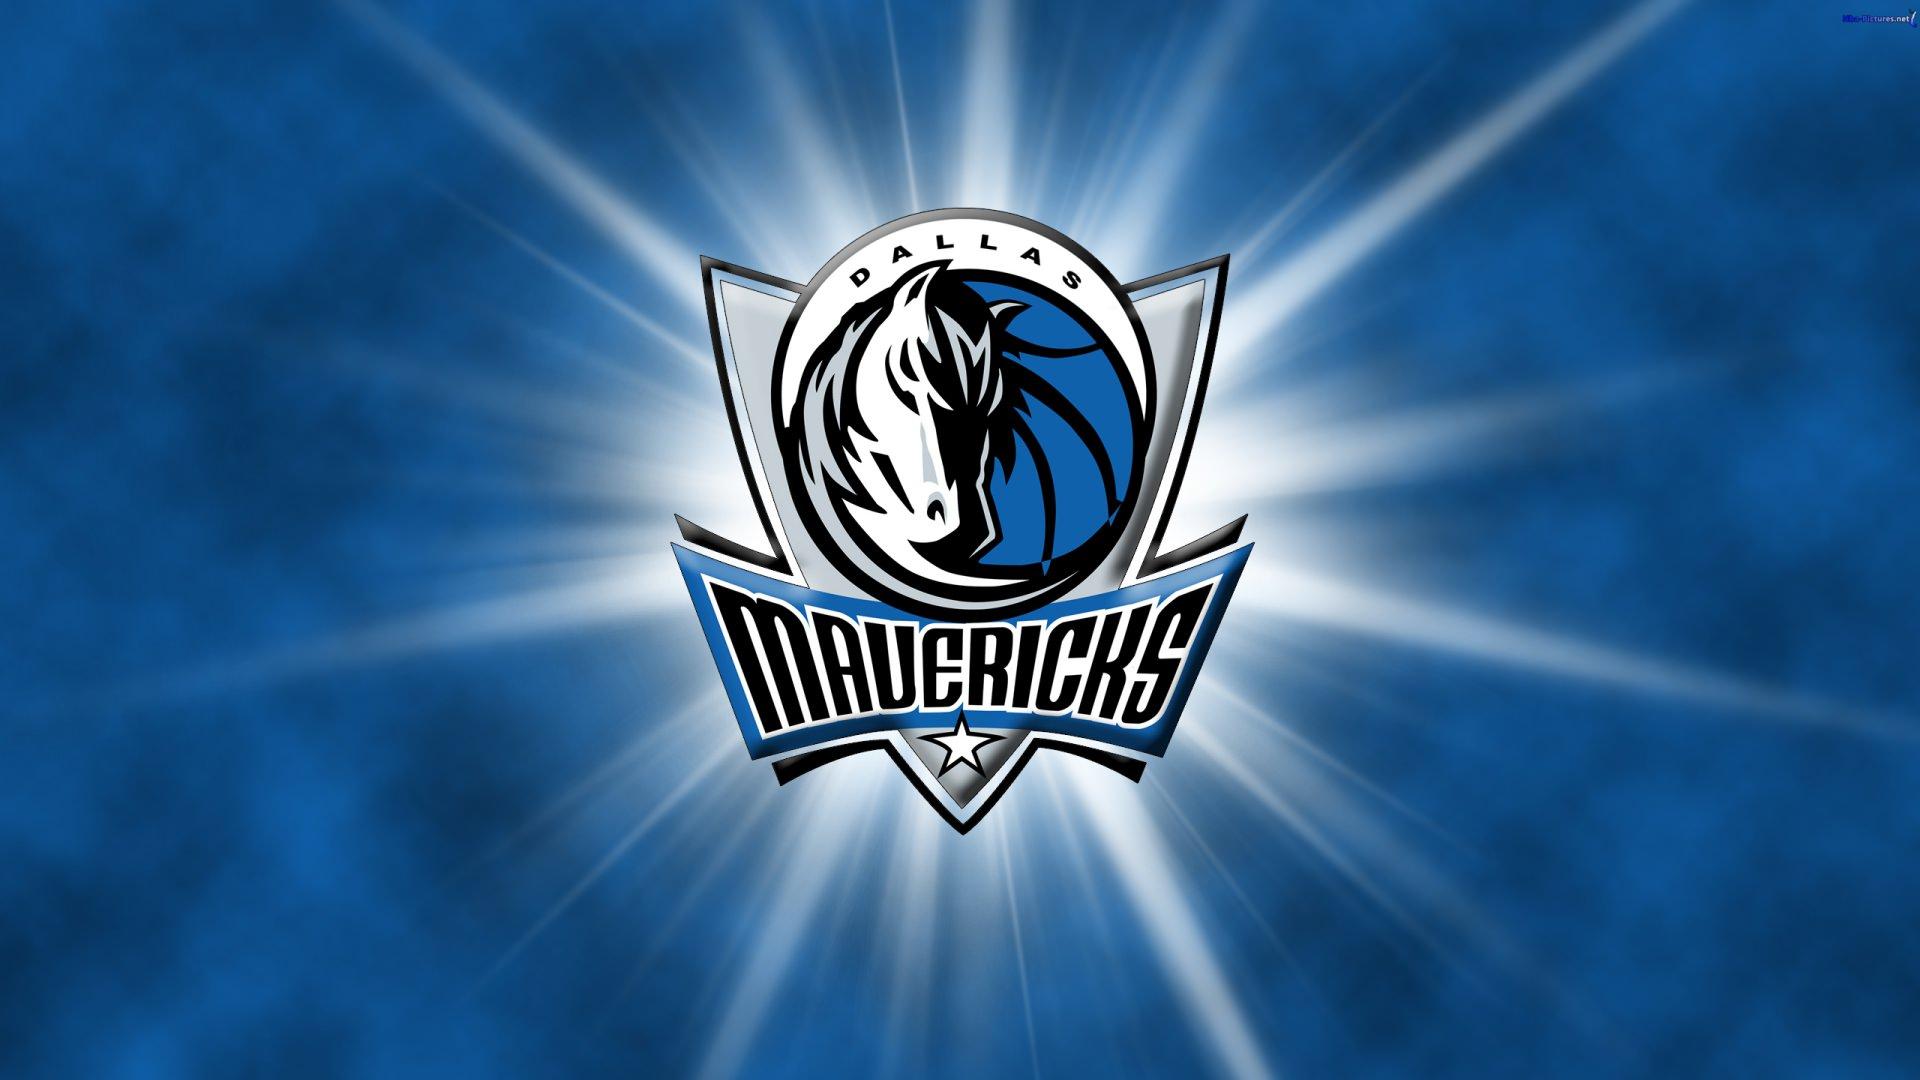 basketball team logo baackground